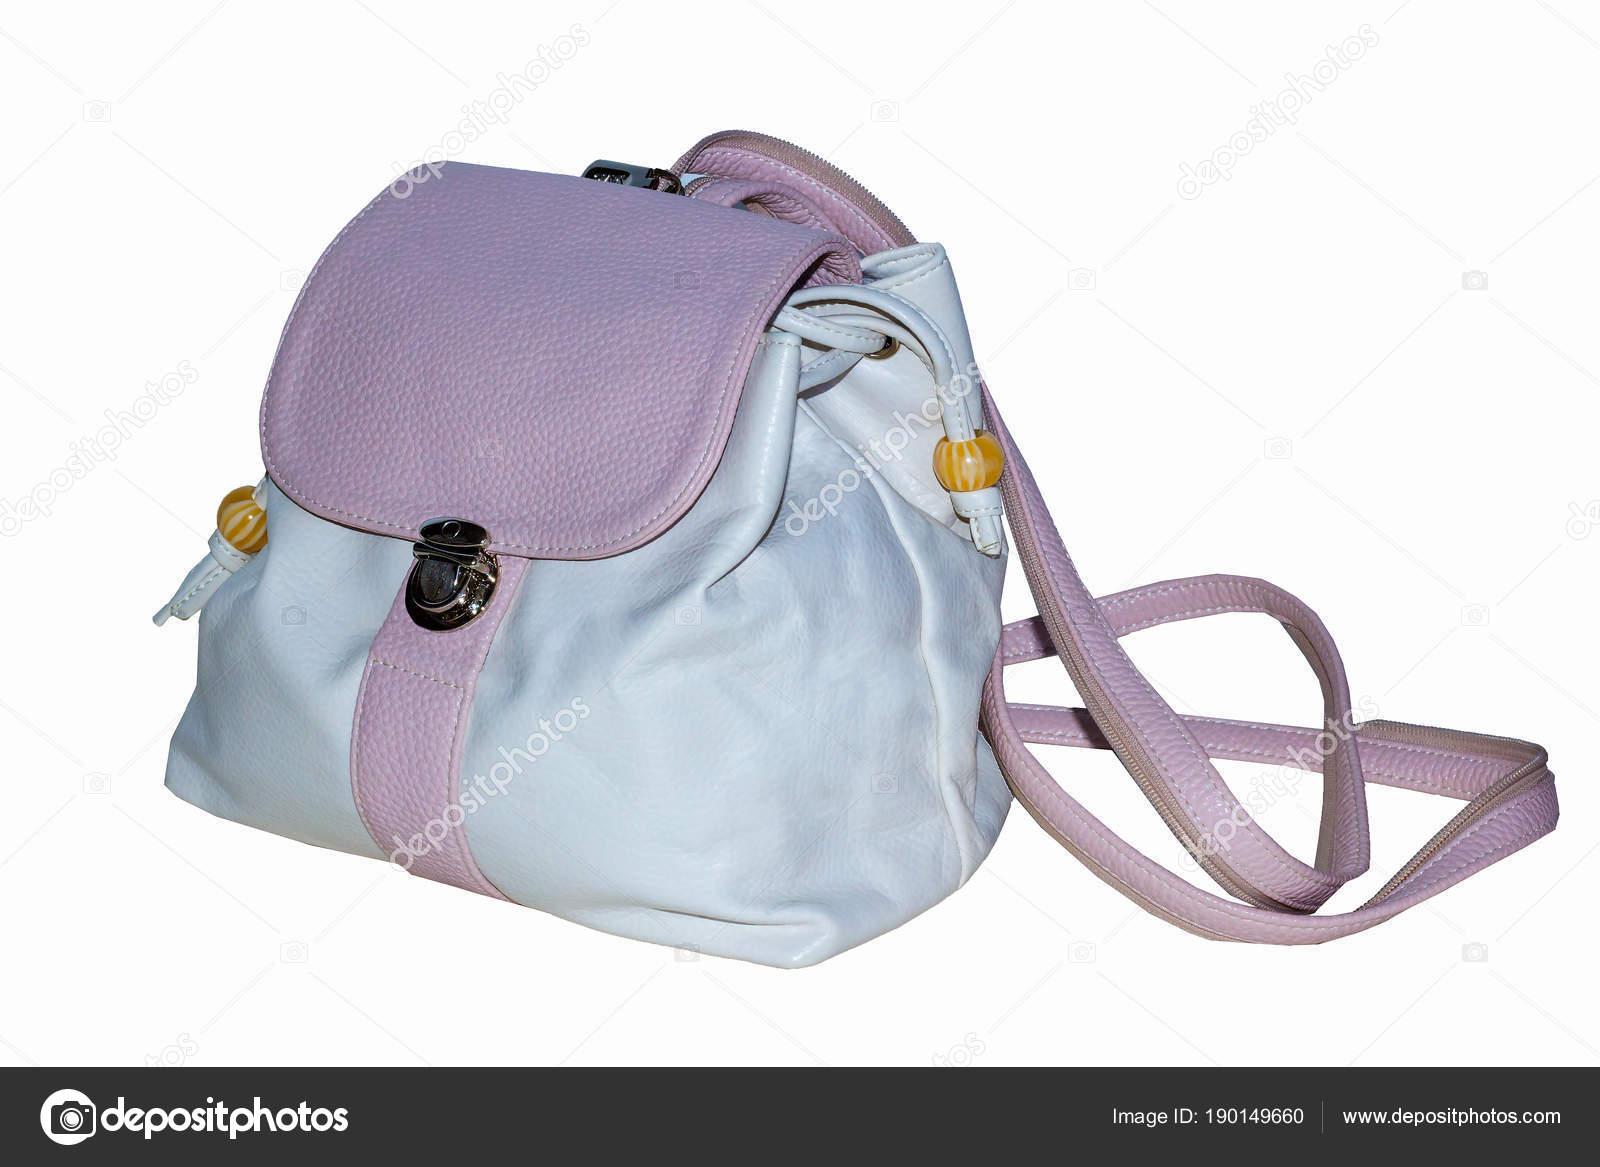 b9e0911653 Γυναικείο σακίδιο πλάτης σε απαλό ροζ χρώμα με λουράκια και καπάκι που  κλειδώνει — Εικόνα από tervolina88 mail.ru